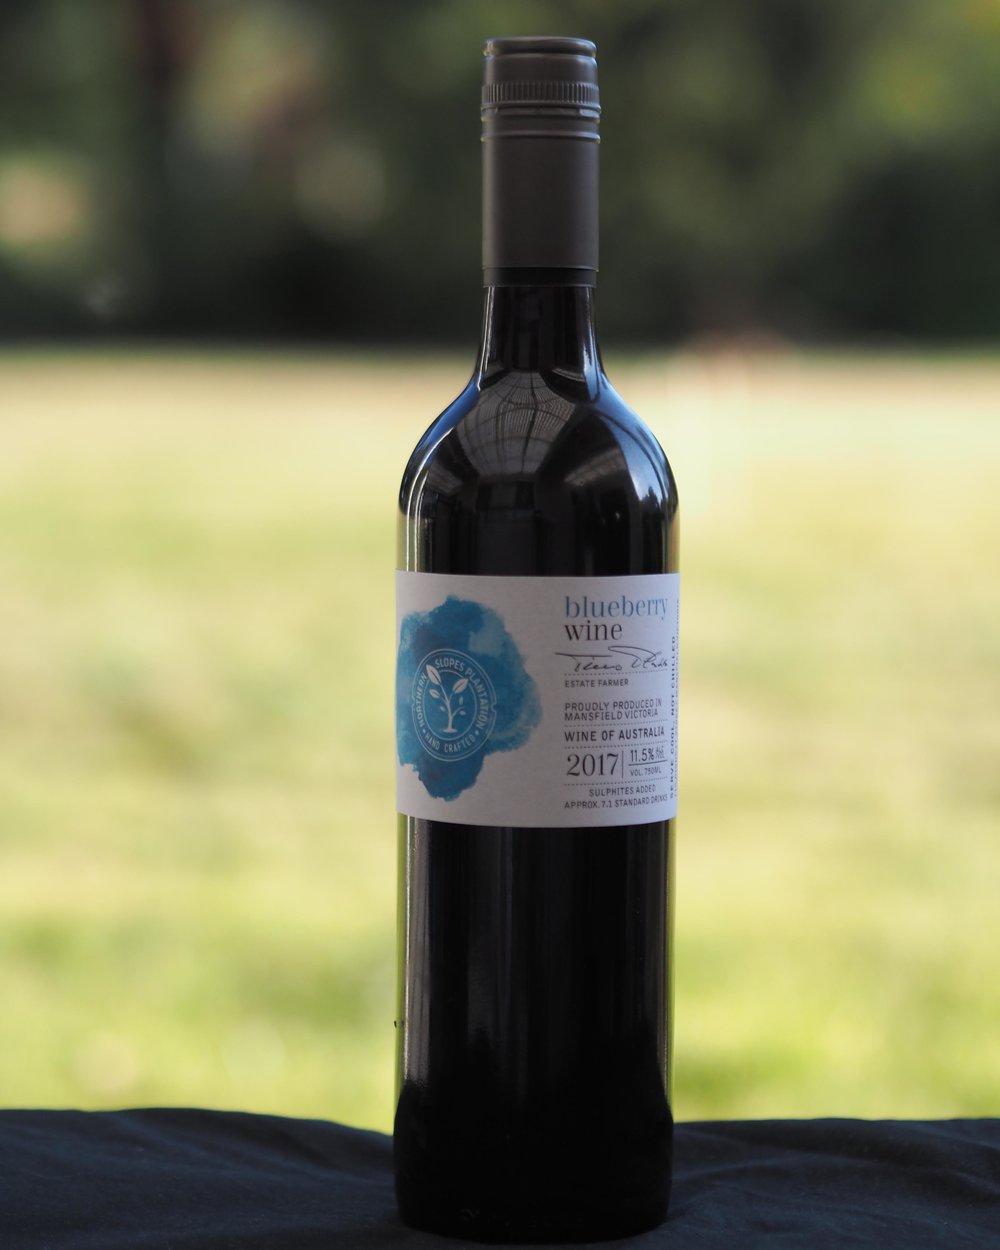 BLUEBERRY WINE - $28 per bottle$300 per dozen